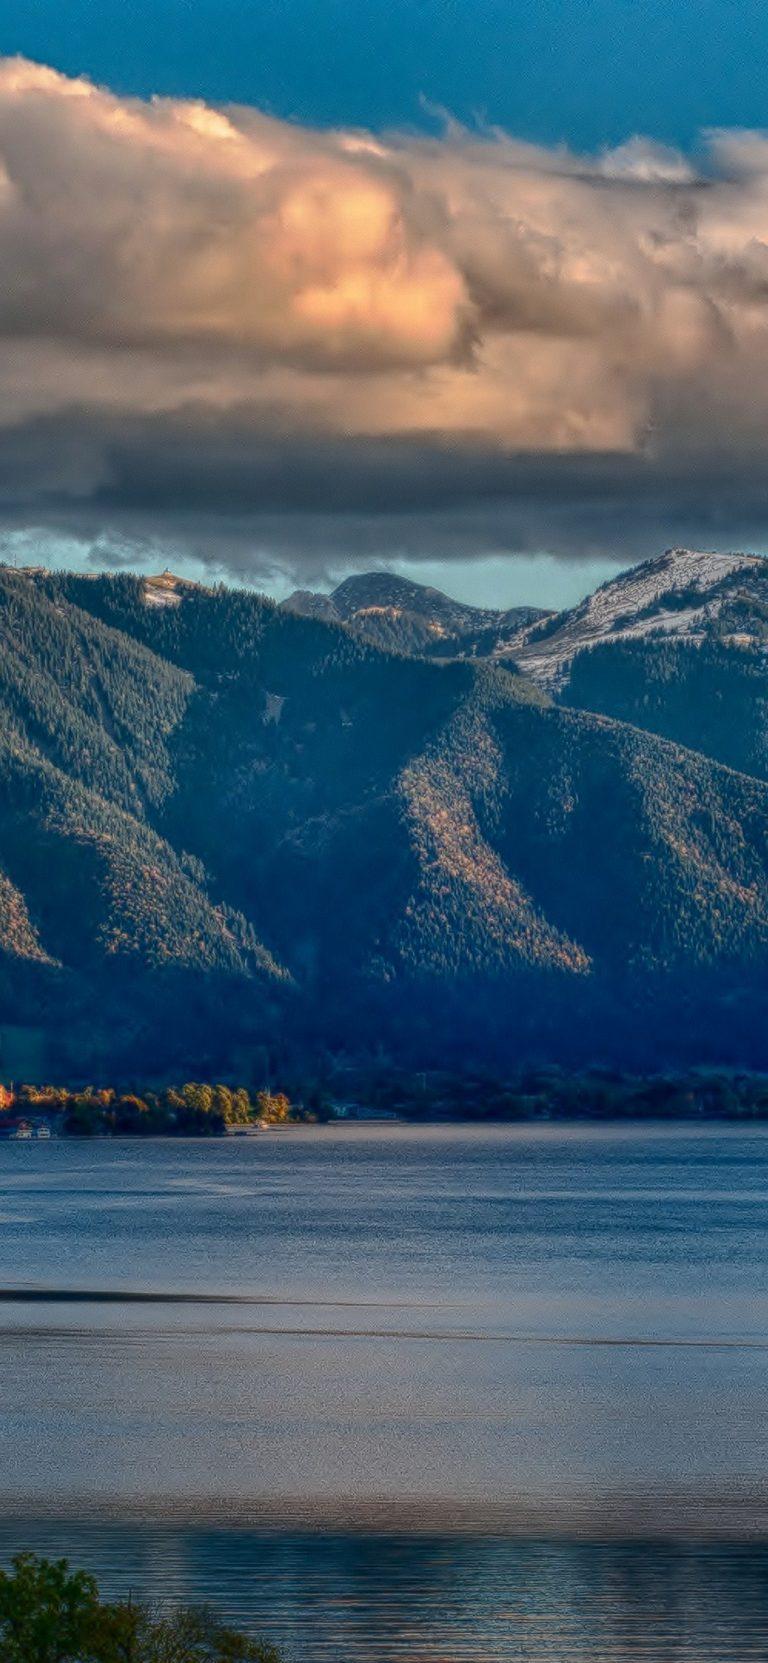 Nature Lake Landscape Reflection HD Wallpaper 1125x2436 768x1663